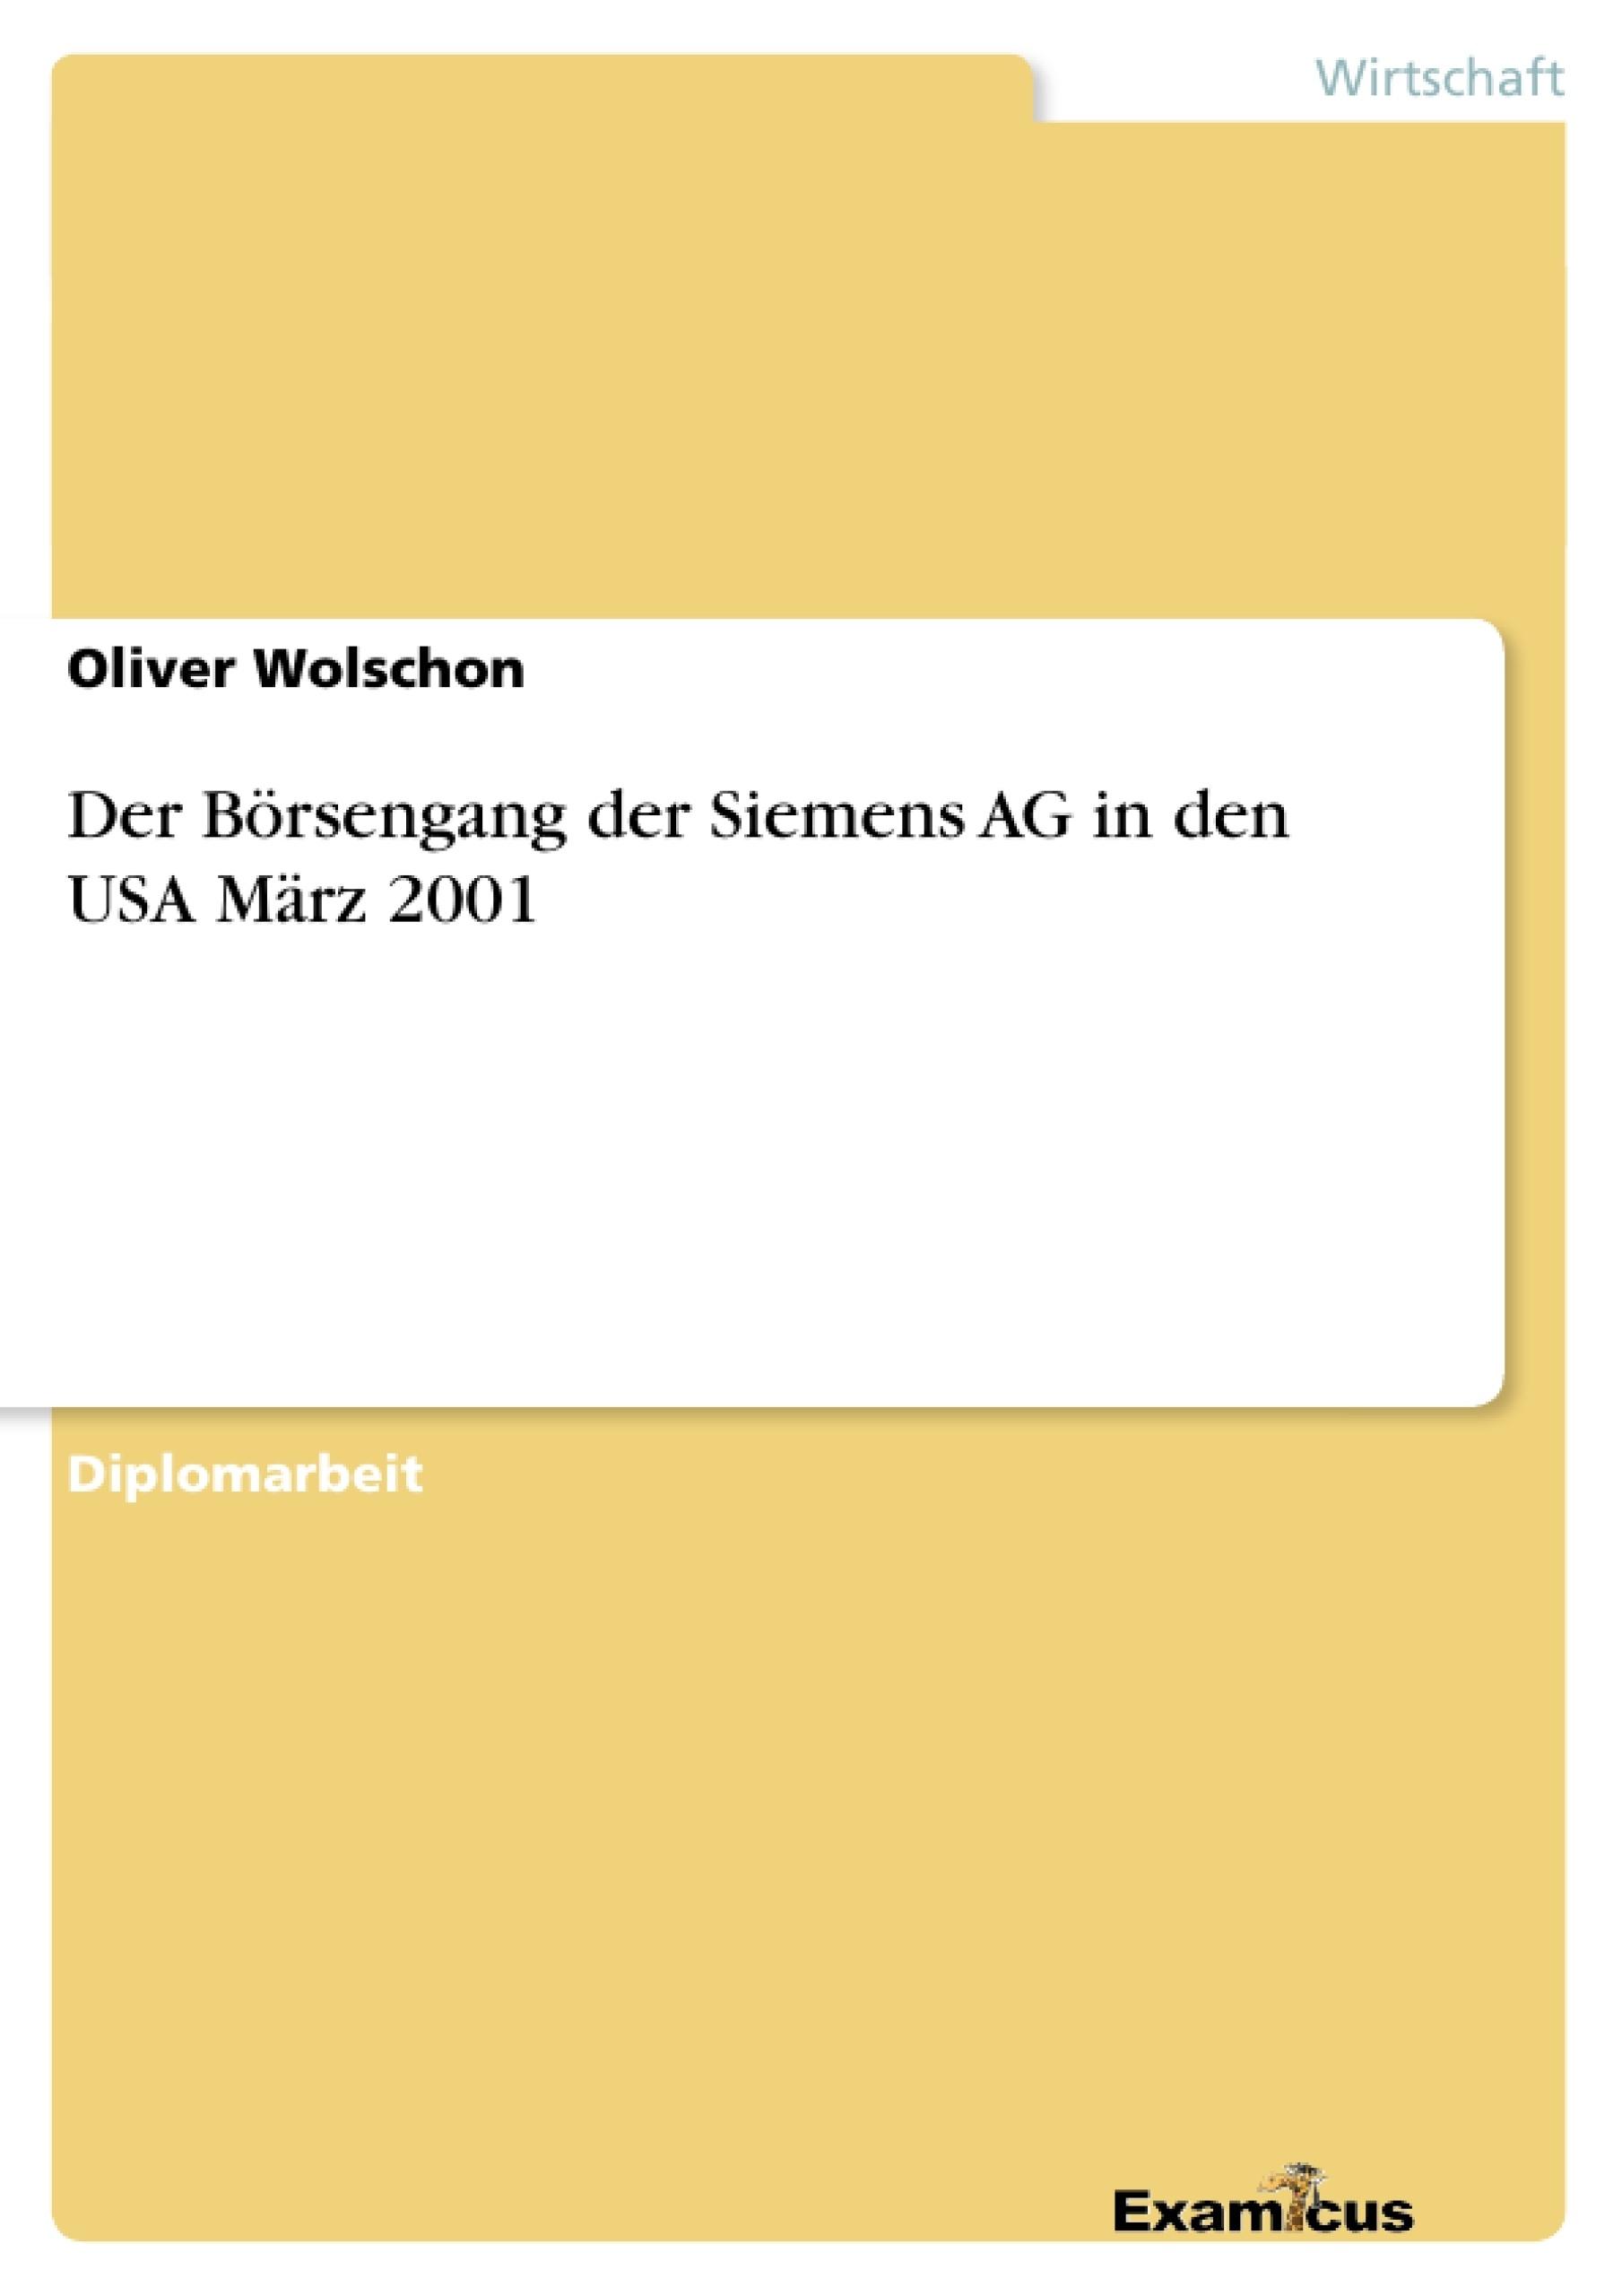 Titel: Der Börsengang der Siemens AG in den USA März 2001